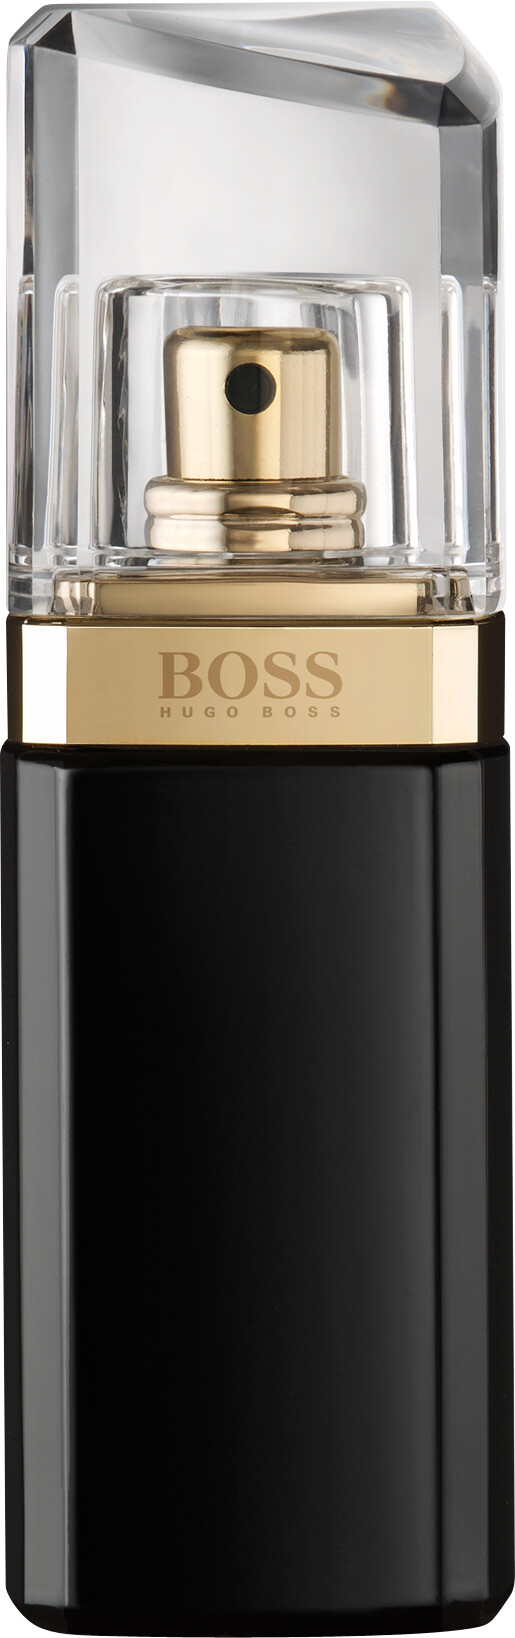 HUGO BOSS BOSS Nuit Pour Femme Eau de Parfum Spray 30ml